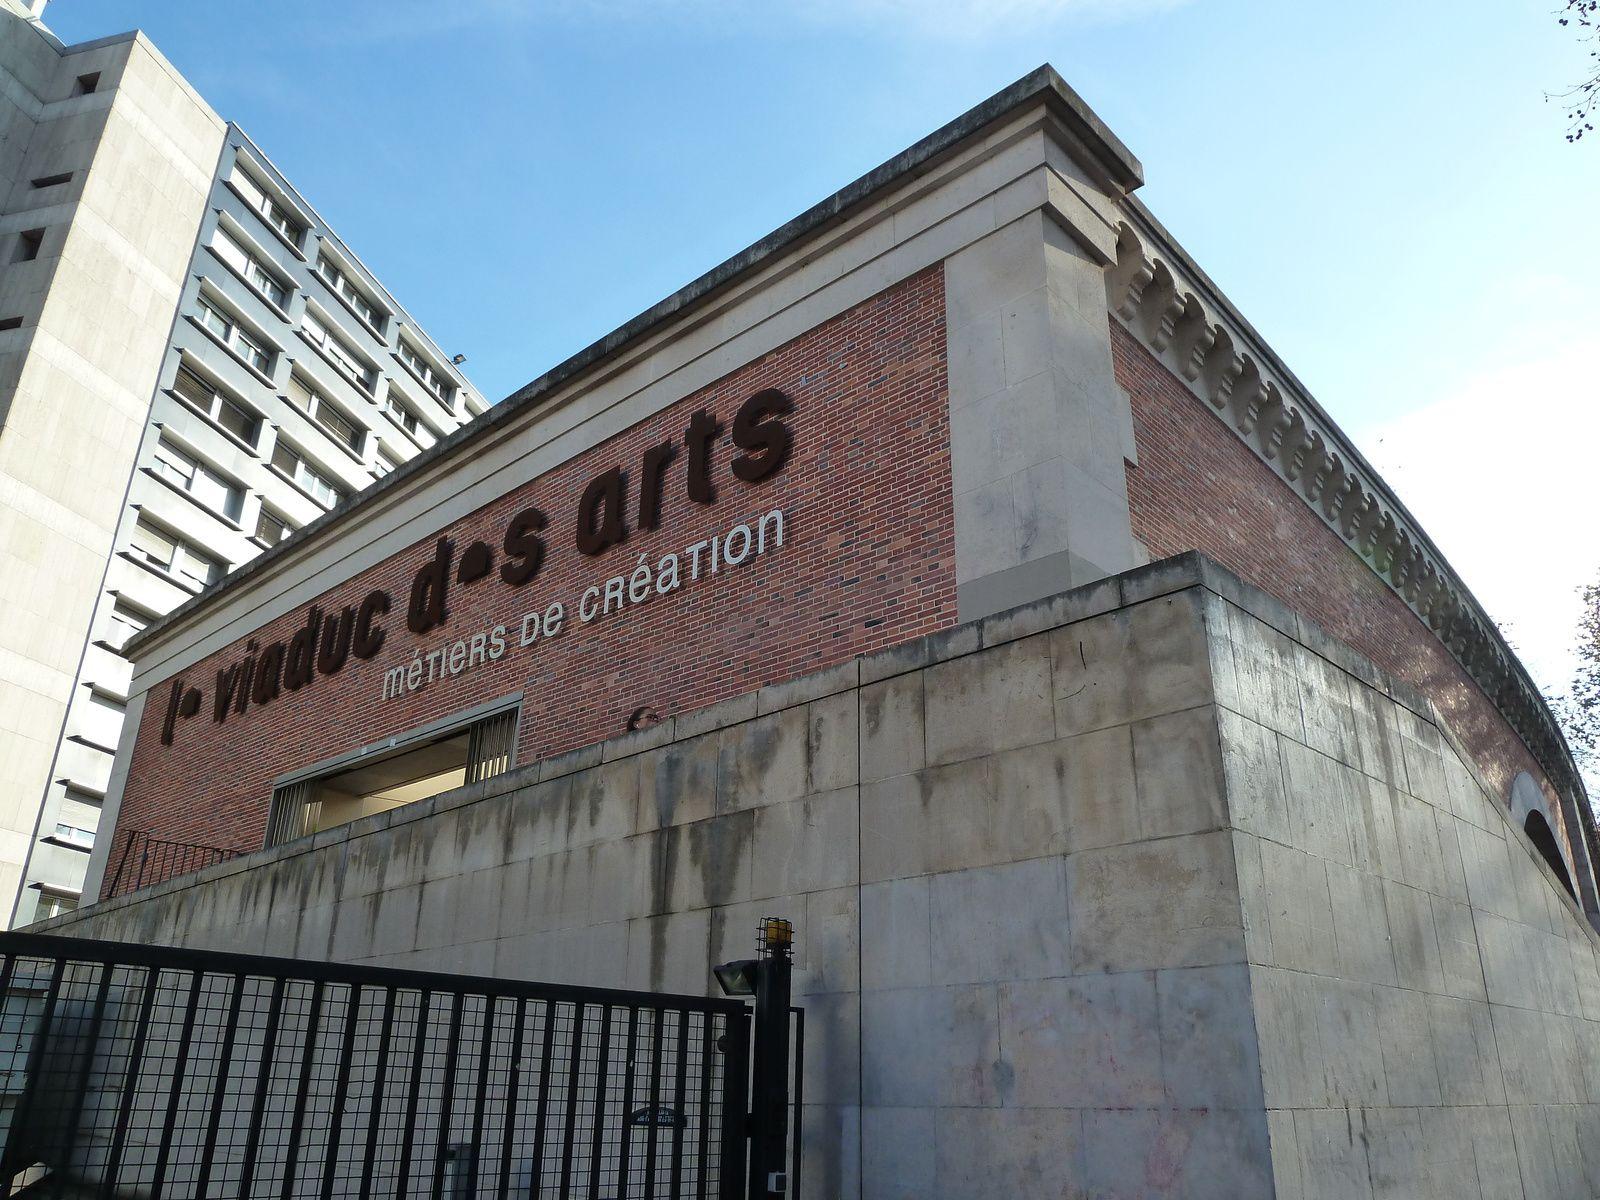 Promenade à Paris automne 2014 - 6/..